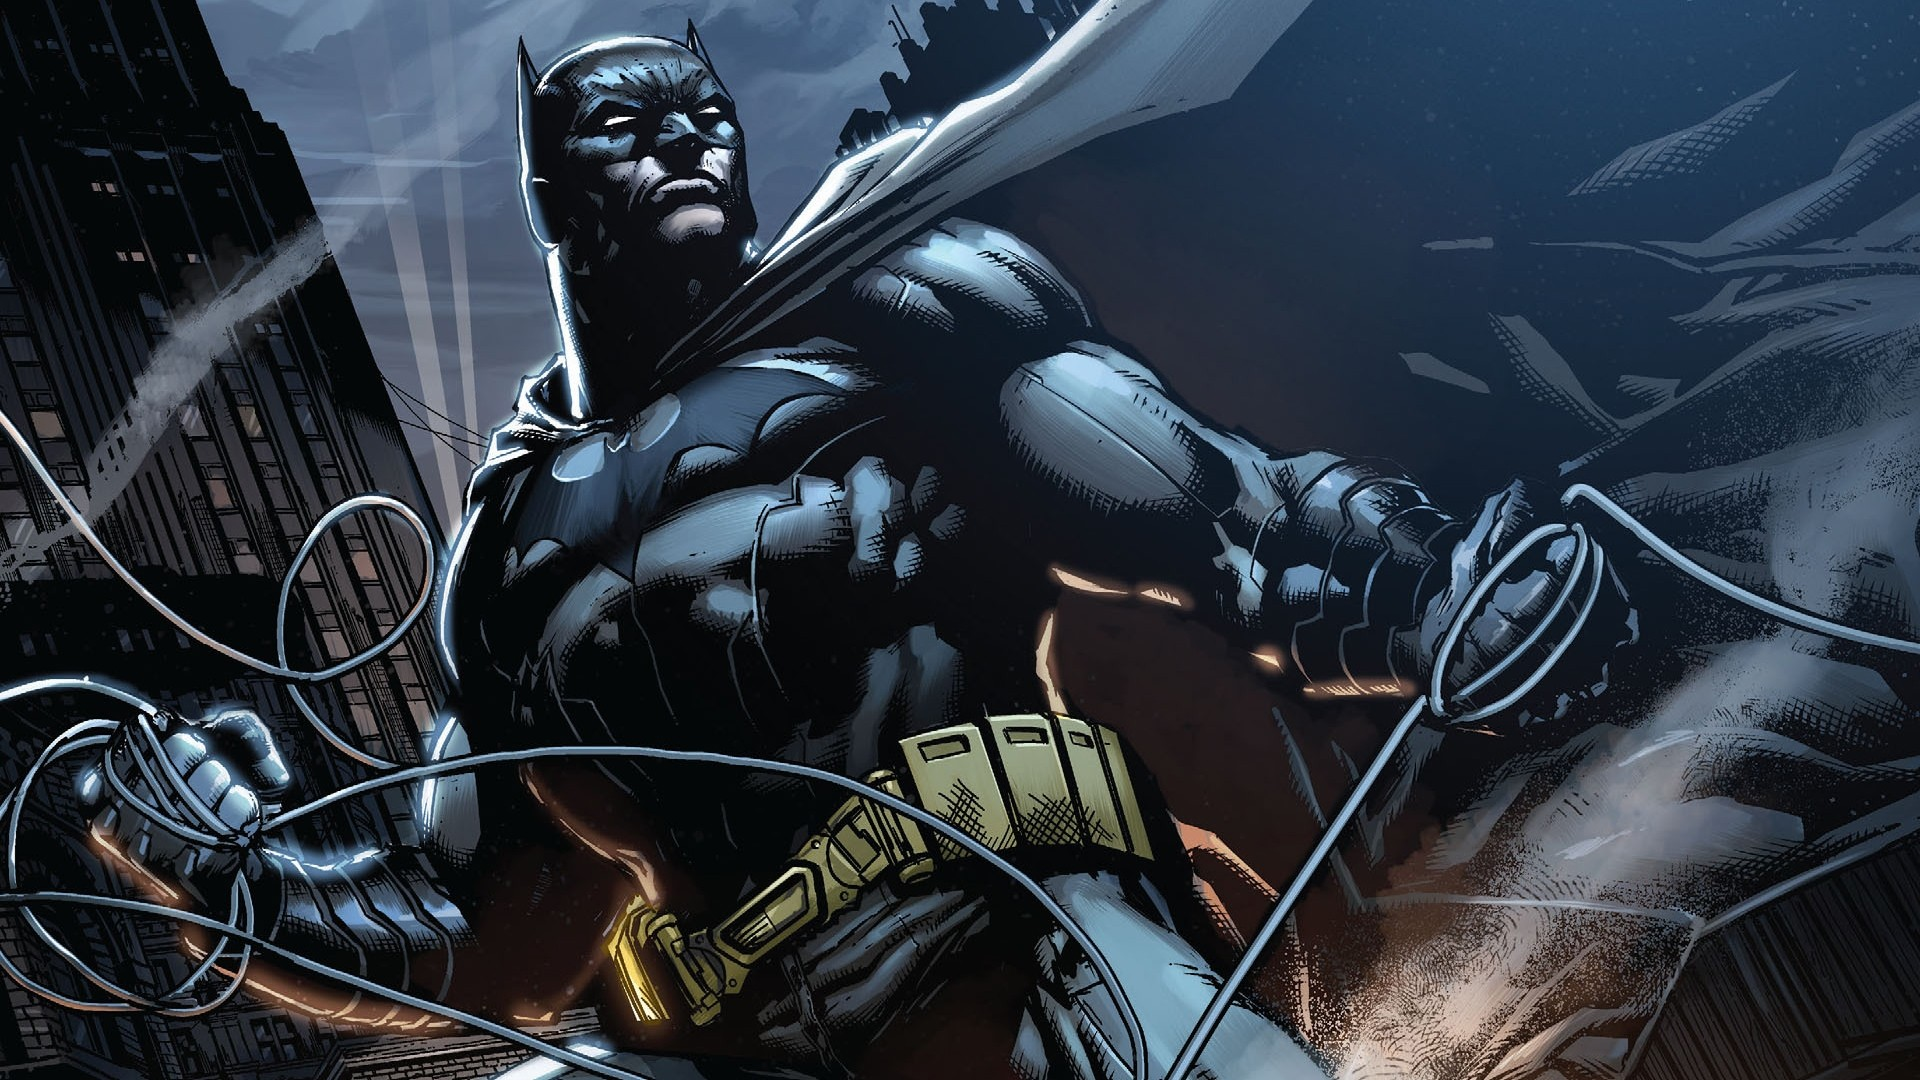 Batman Art wallpaper for computer